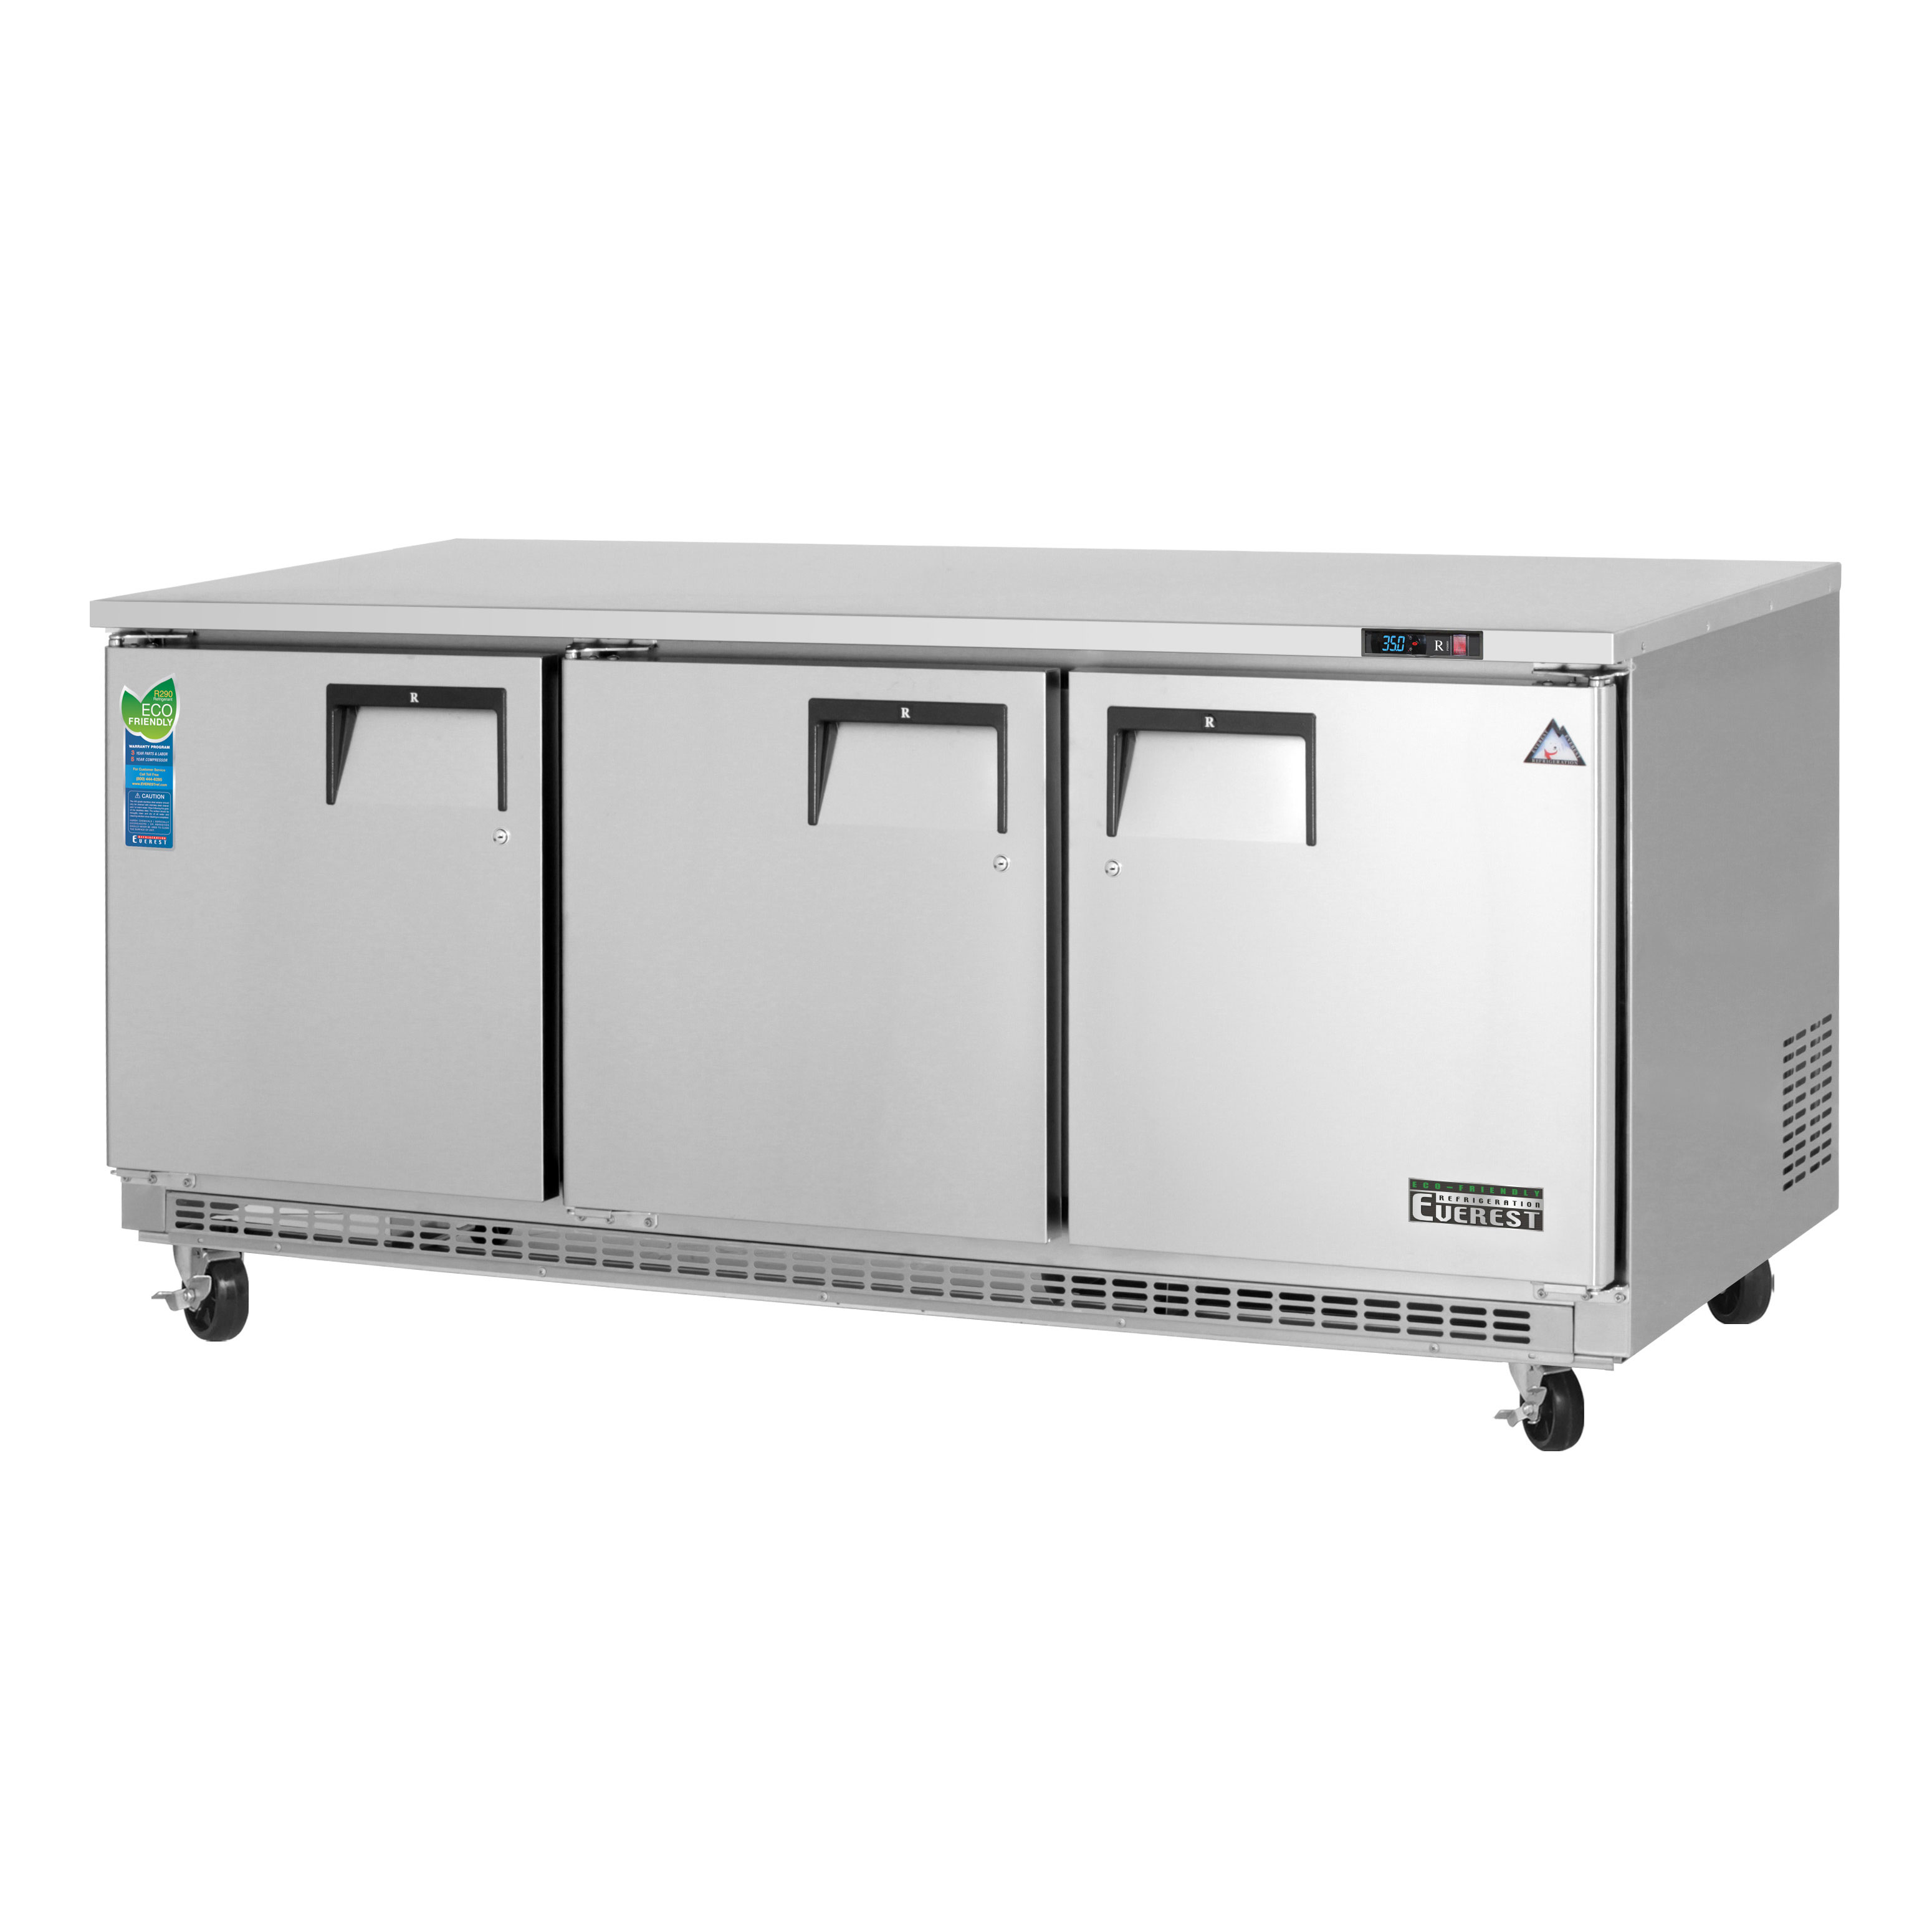 Everest Refrigeration ETBR3 refrigerator, undercounter, reach-in